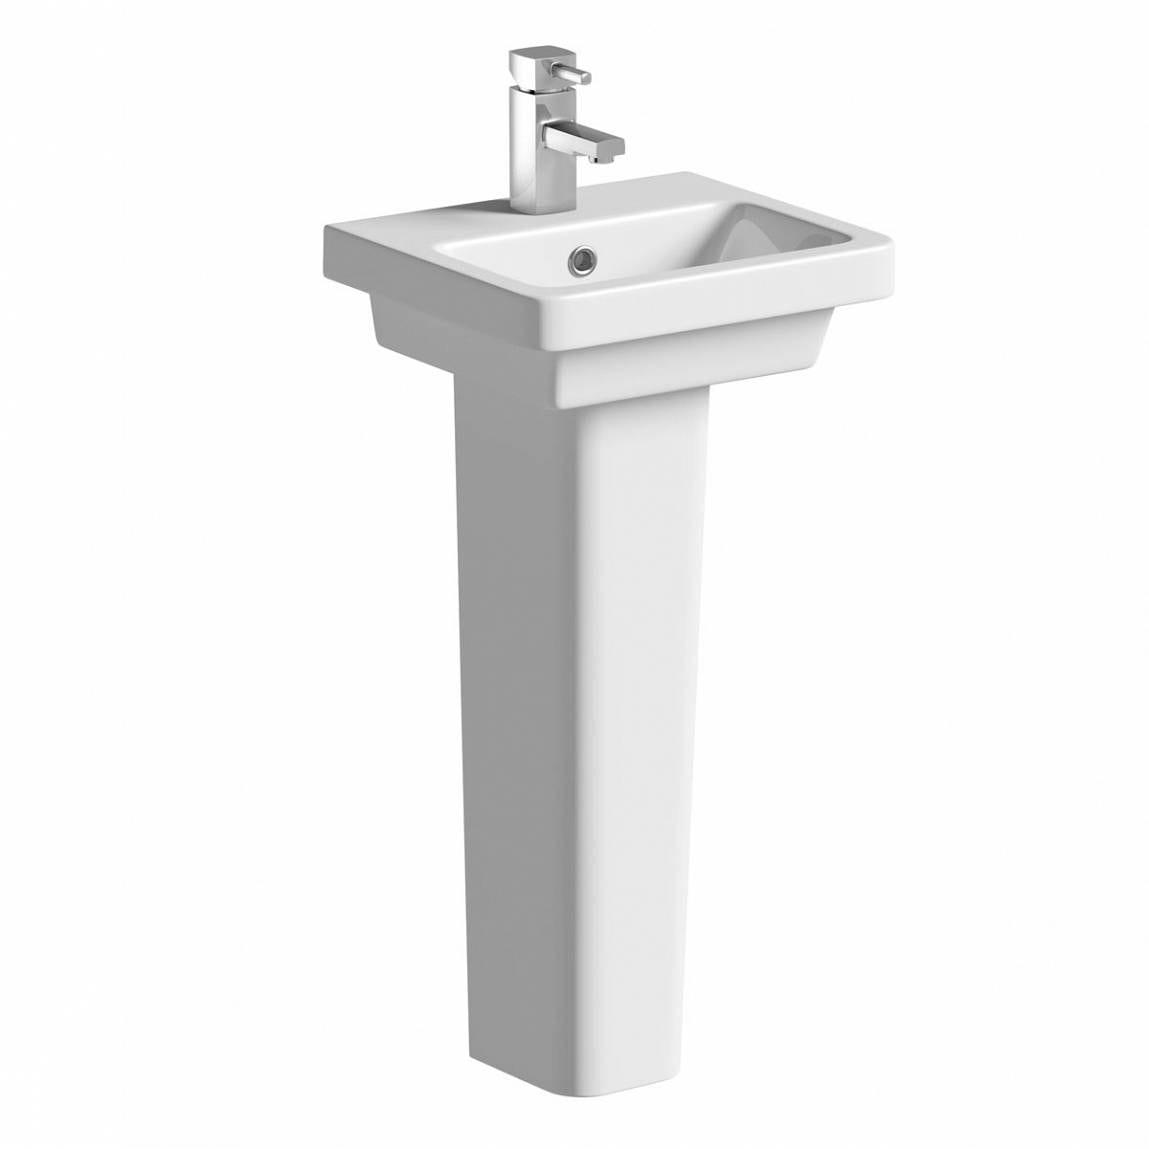 Mode Cooper 1 tap hole full pedestal basin 400mm